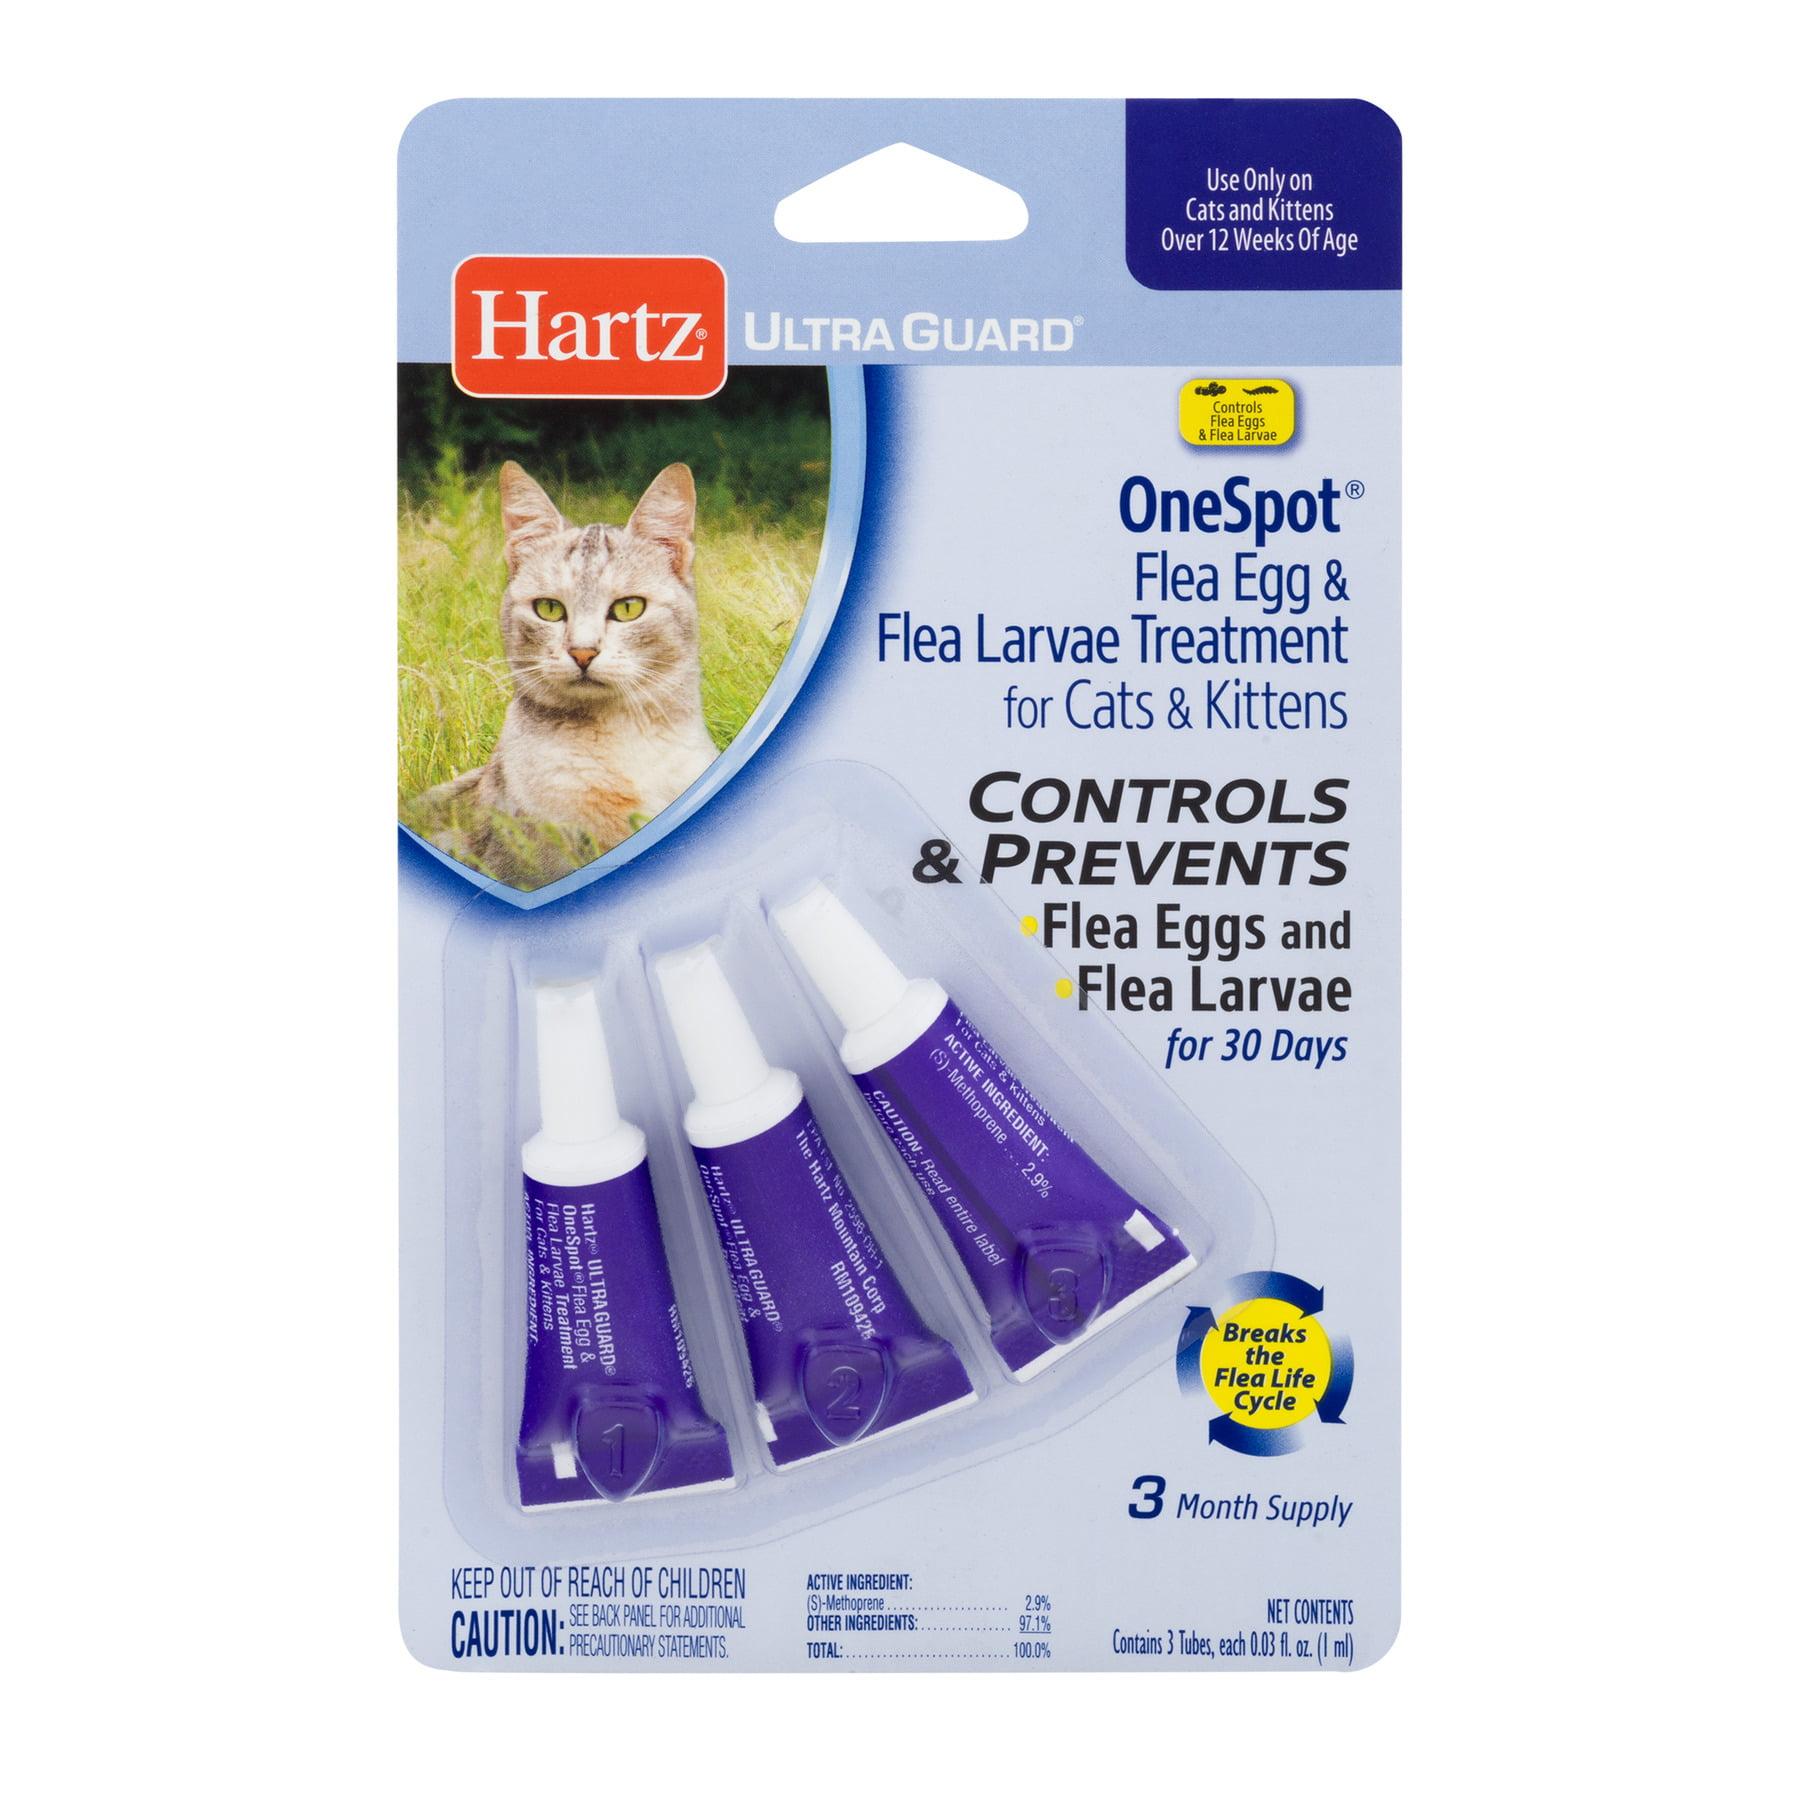 Hartz UltraGuard One Spot Flea Egg & Flea Larvae Treatment for Cats & Kittens, 0.03 oz, 3 count